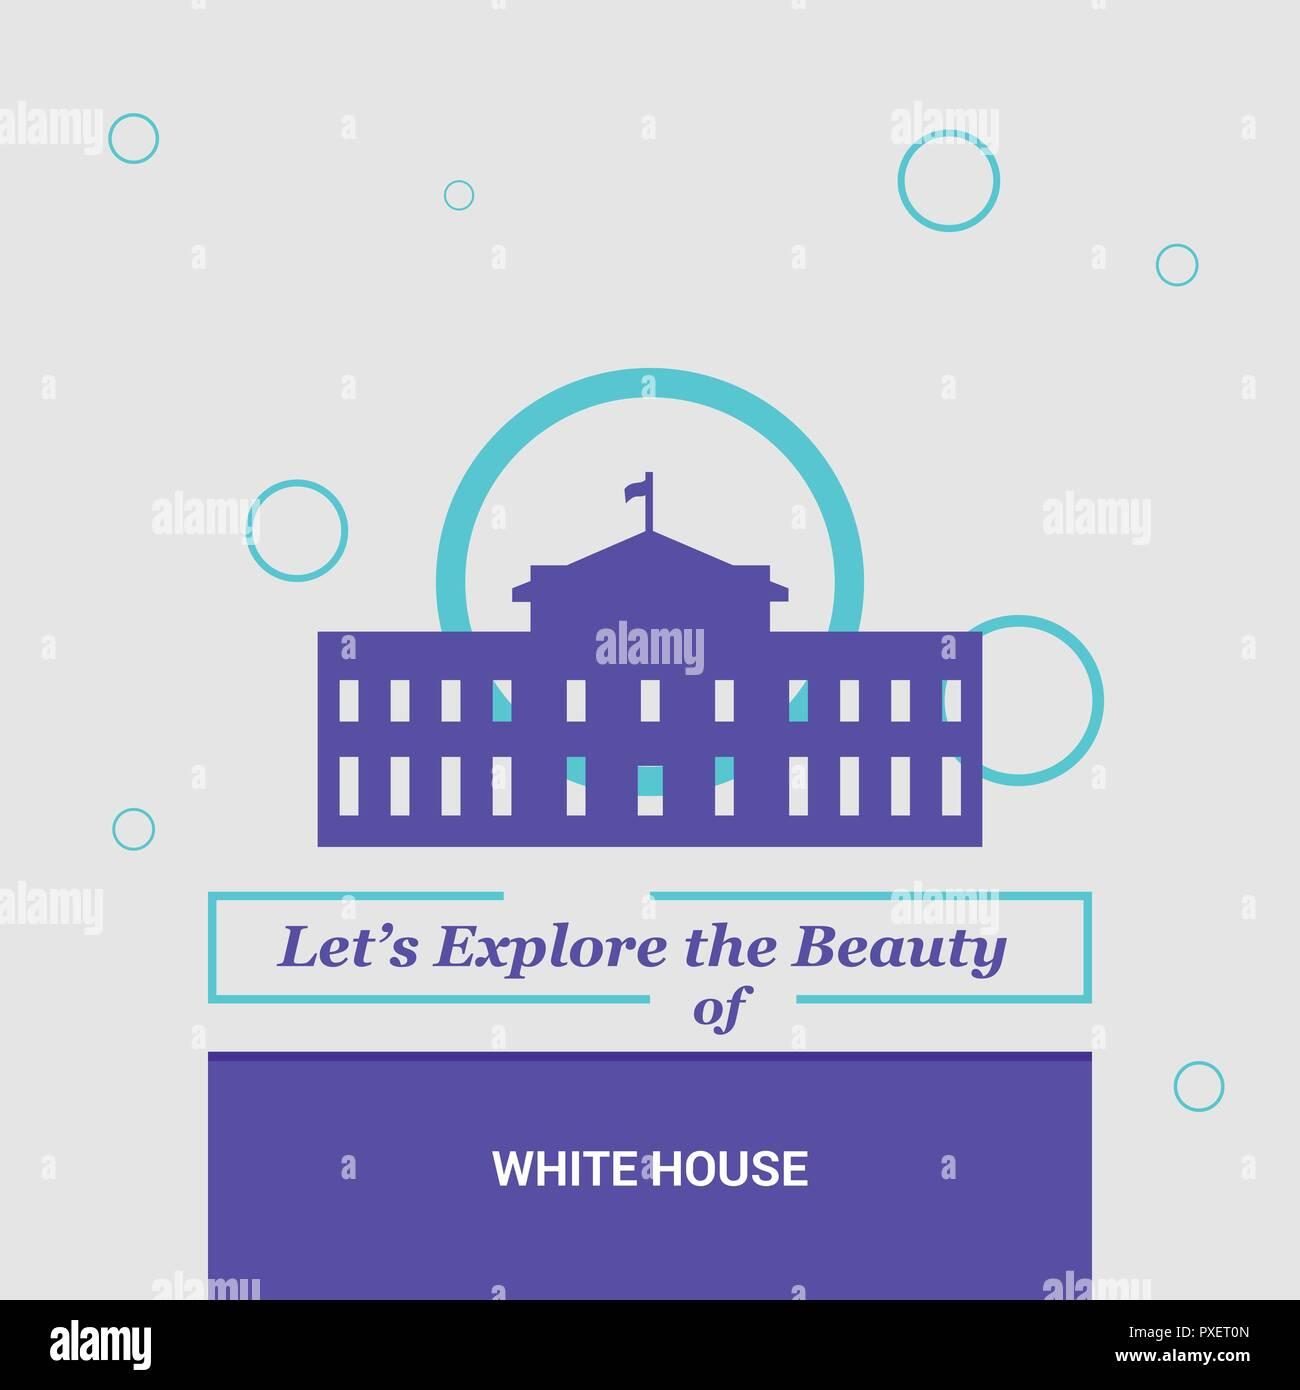 Let's Explore the beauty of White house Washington, D.C.  U.S.A National Landmarks - Stock Vector